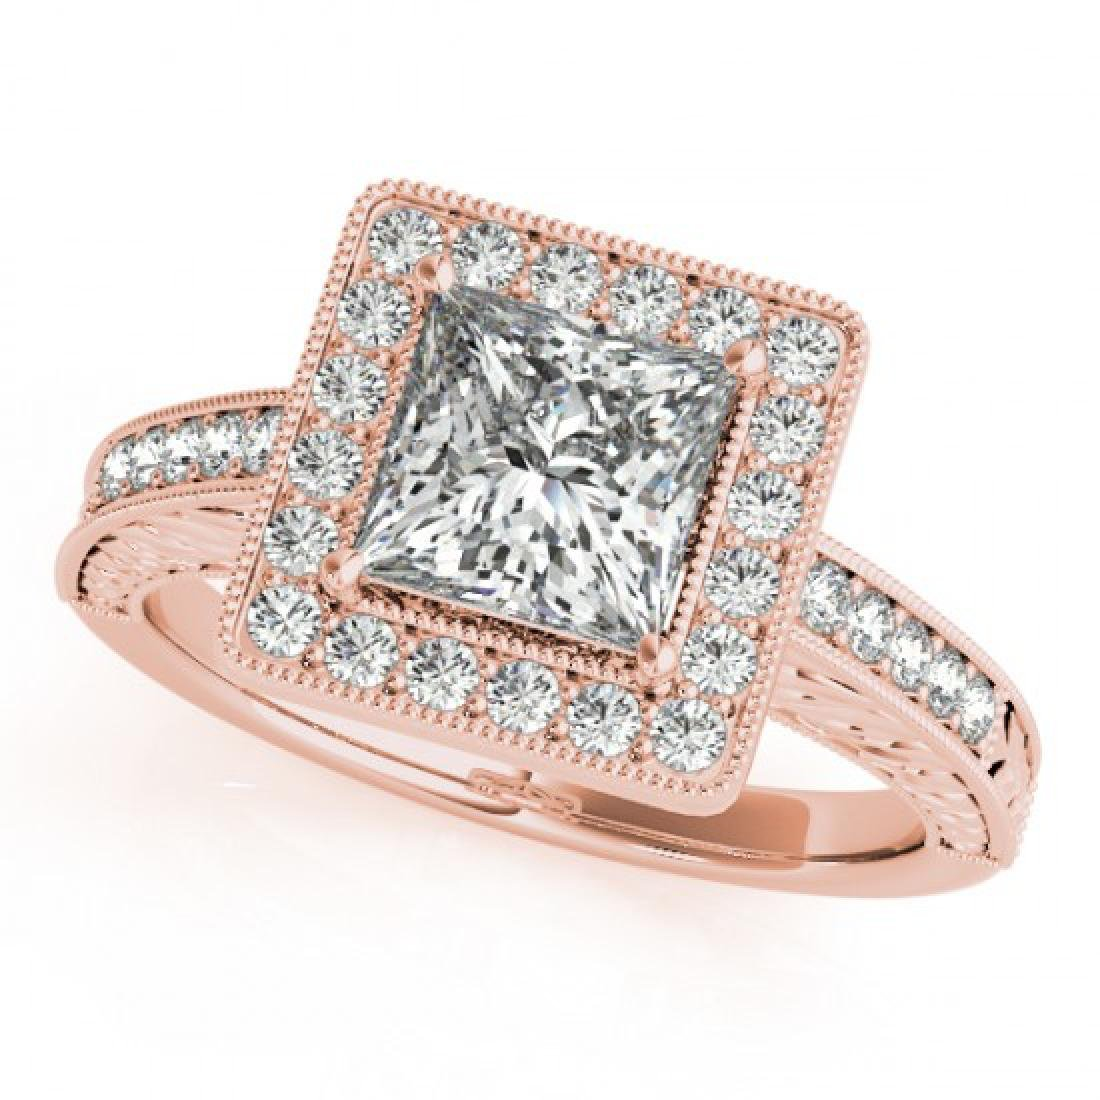 1.05 CTW Certified VS/SI Princess Diamond Solitaire - 2